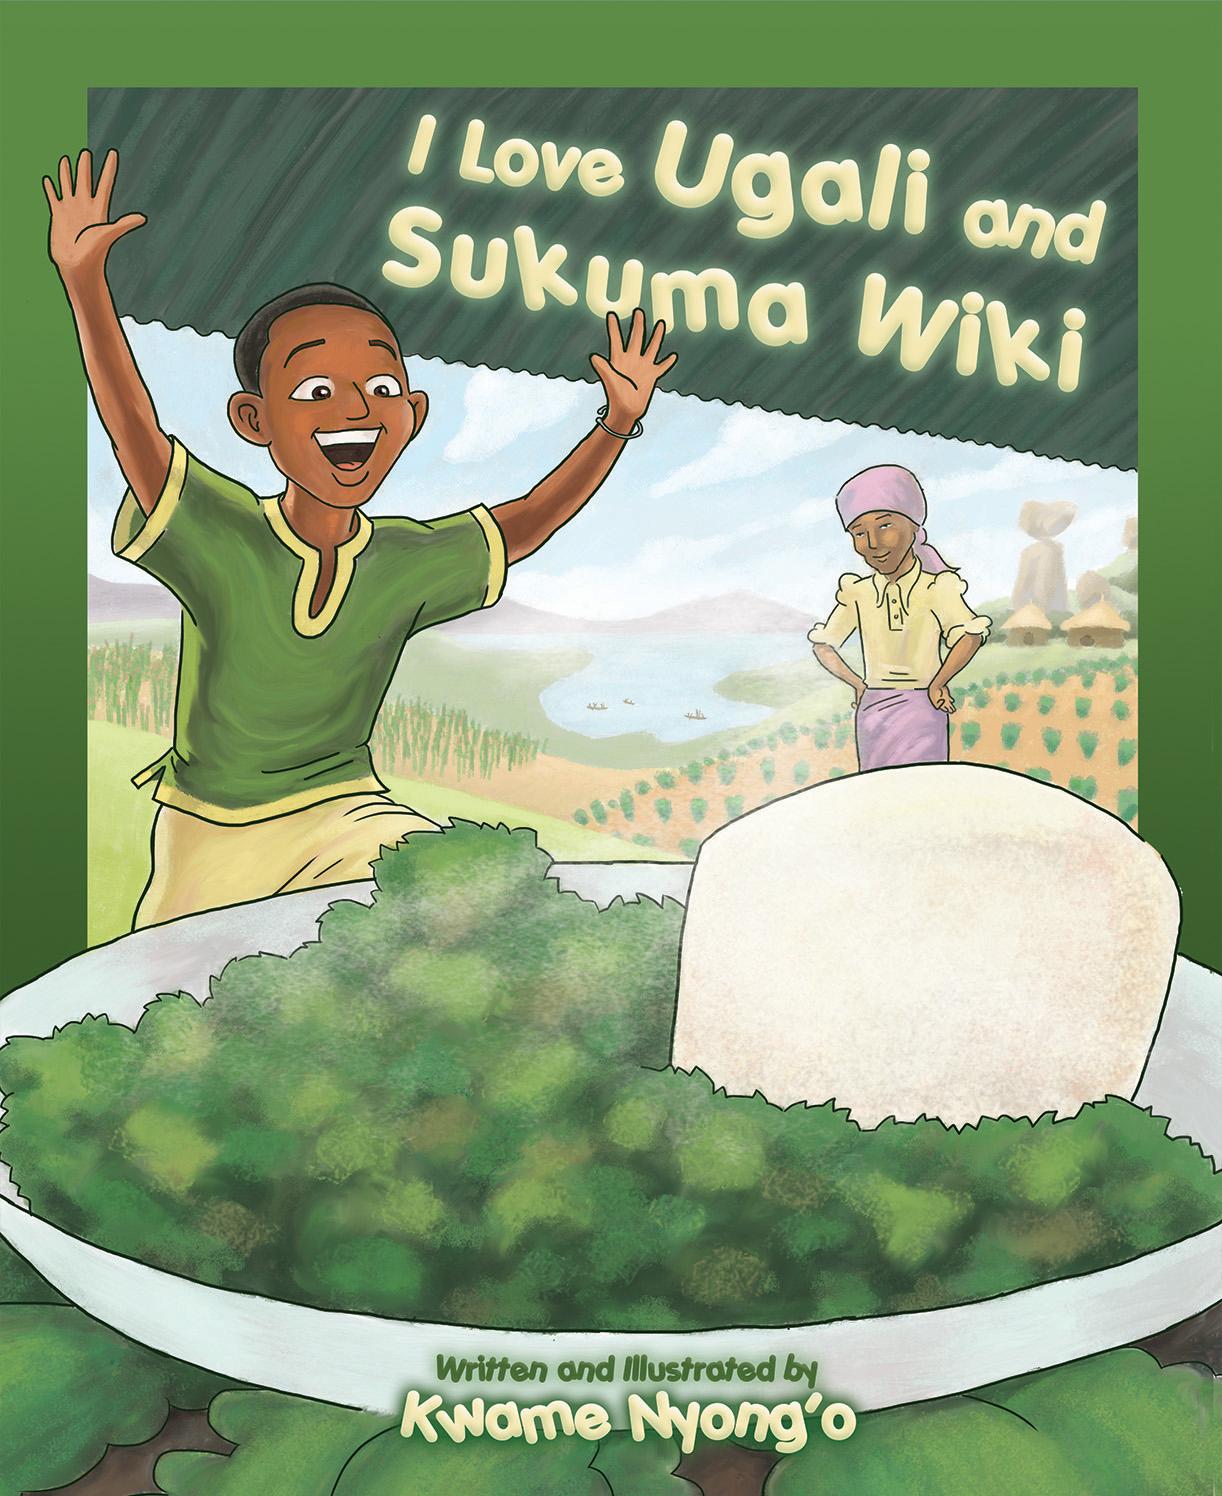 I Love Ugali and Sukuma Wiki cover.jpg